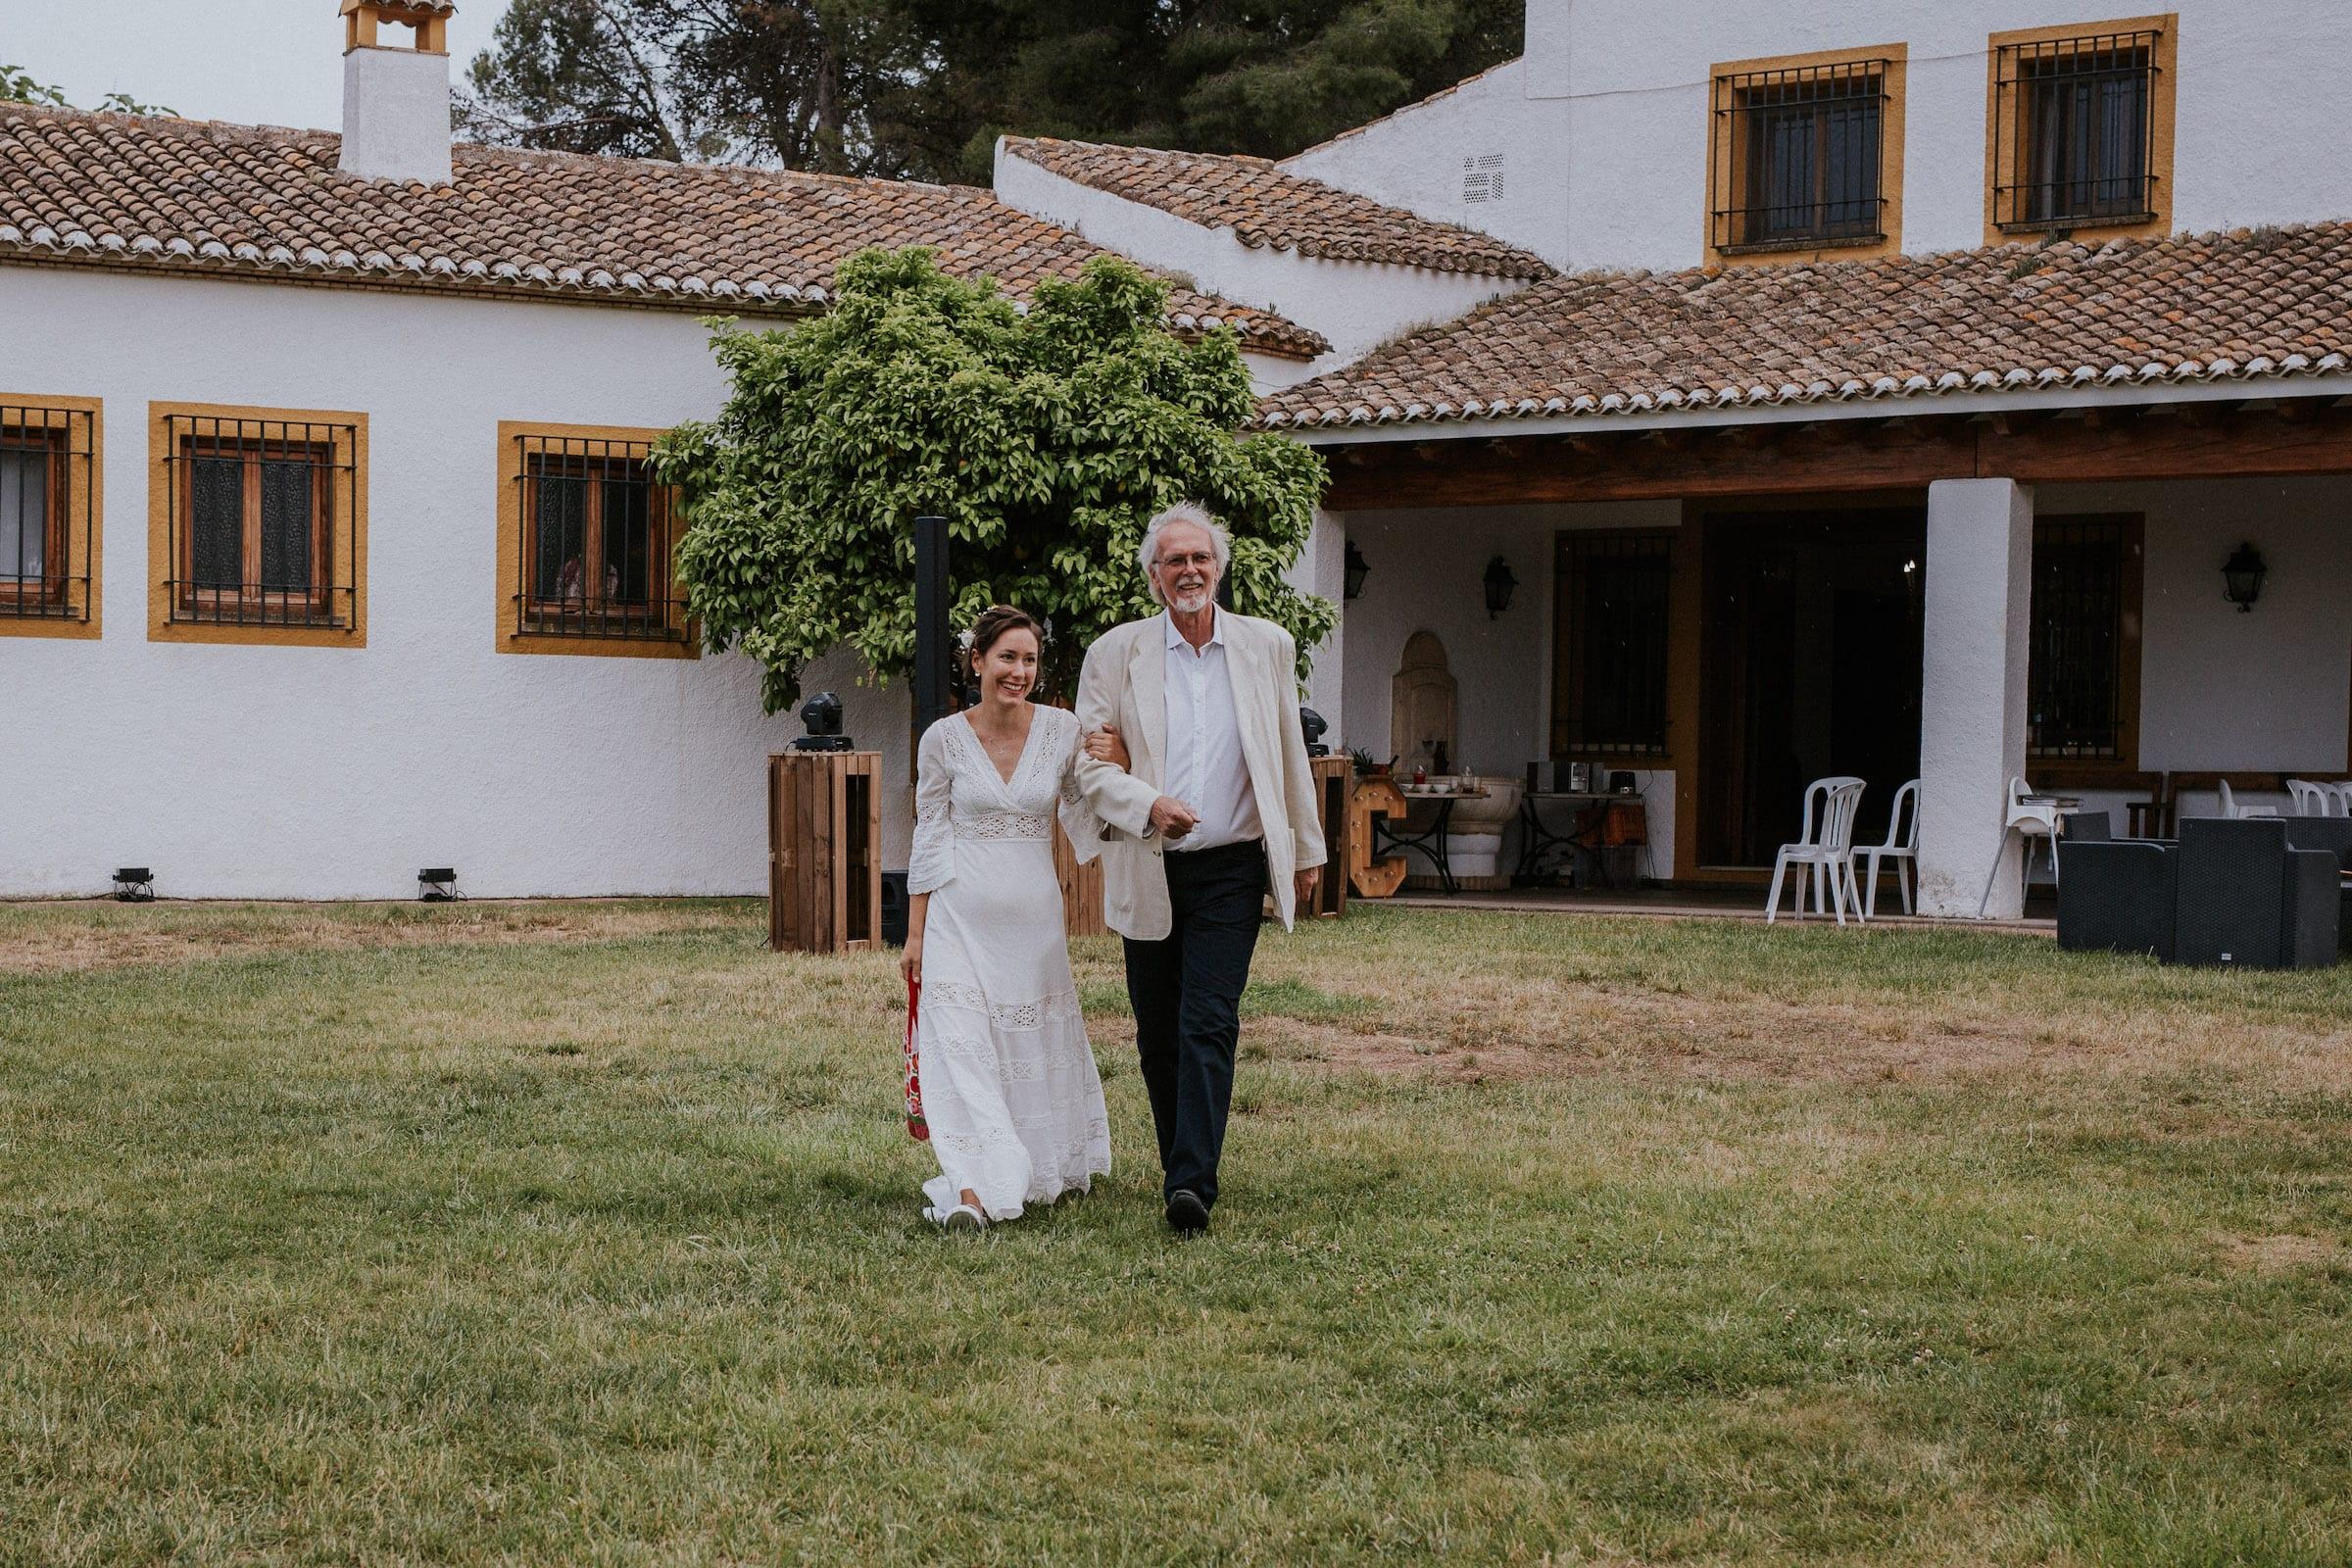 070+wedding+in+valencia+weddingphotographer.jpg